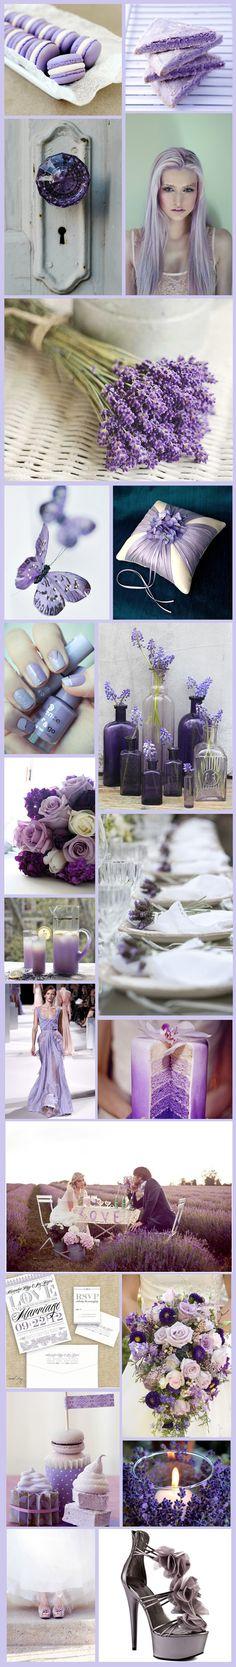 Lavender Love Inspiration Board